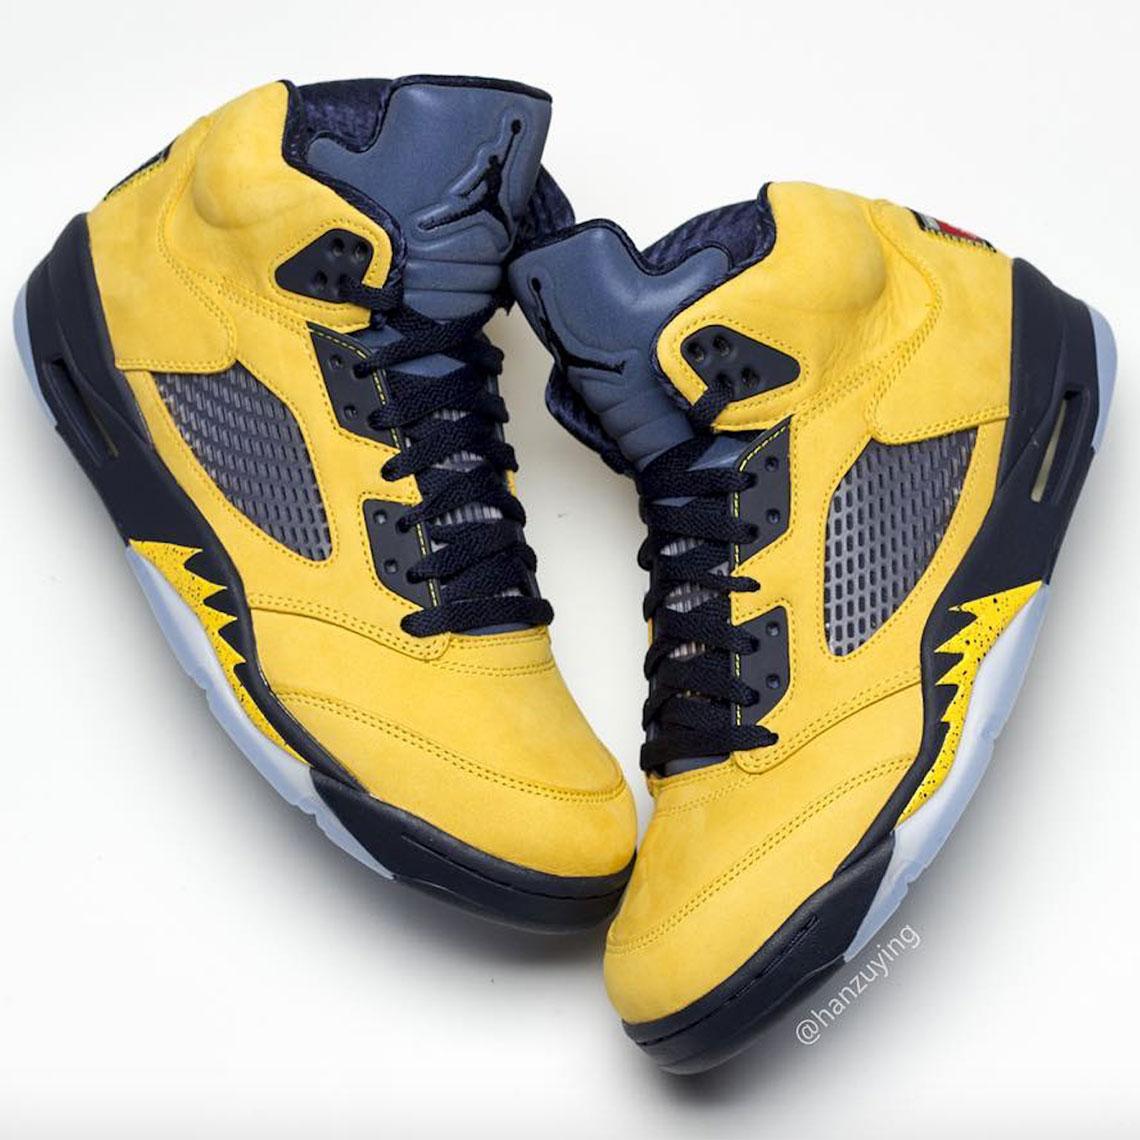 best sneakers d000e 2c6ce Air Jordan 5 Michigan